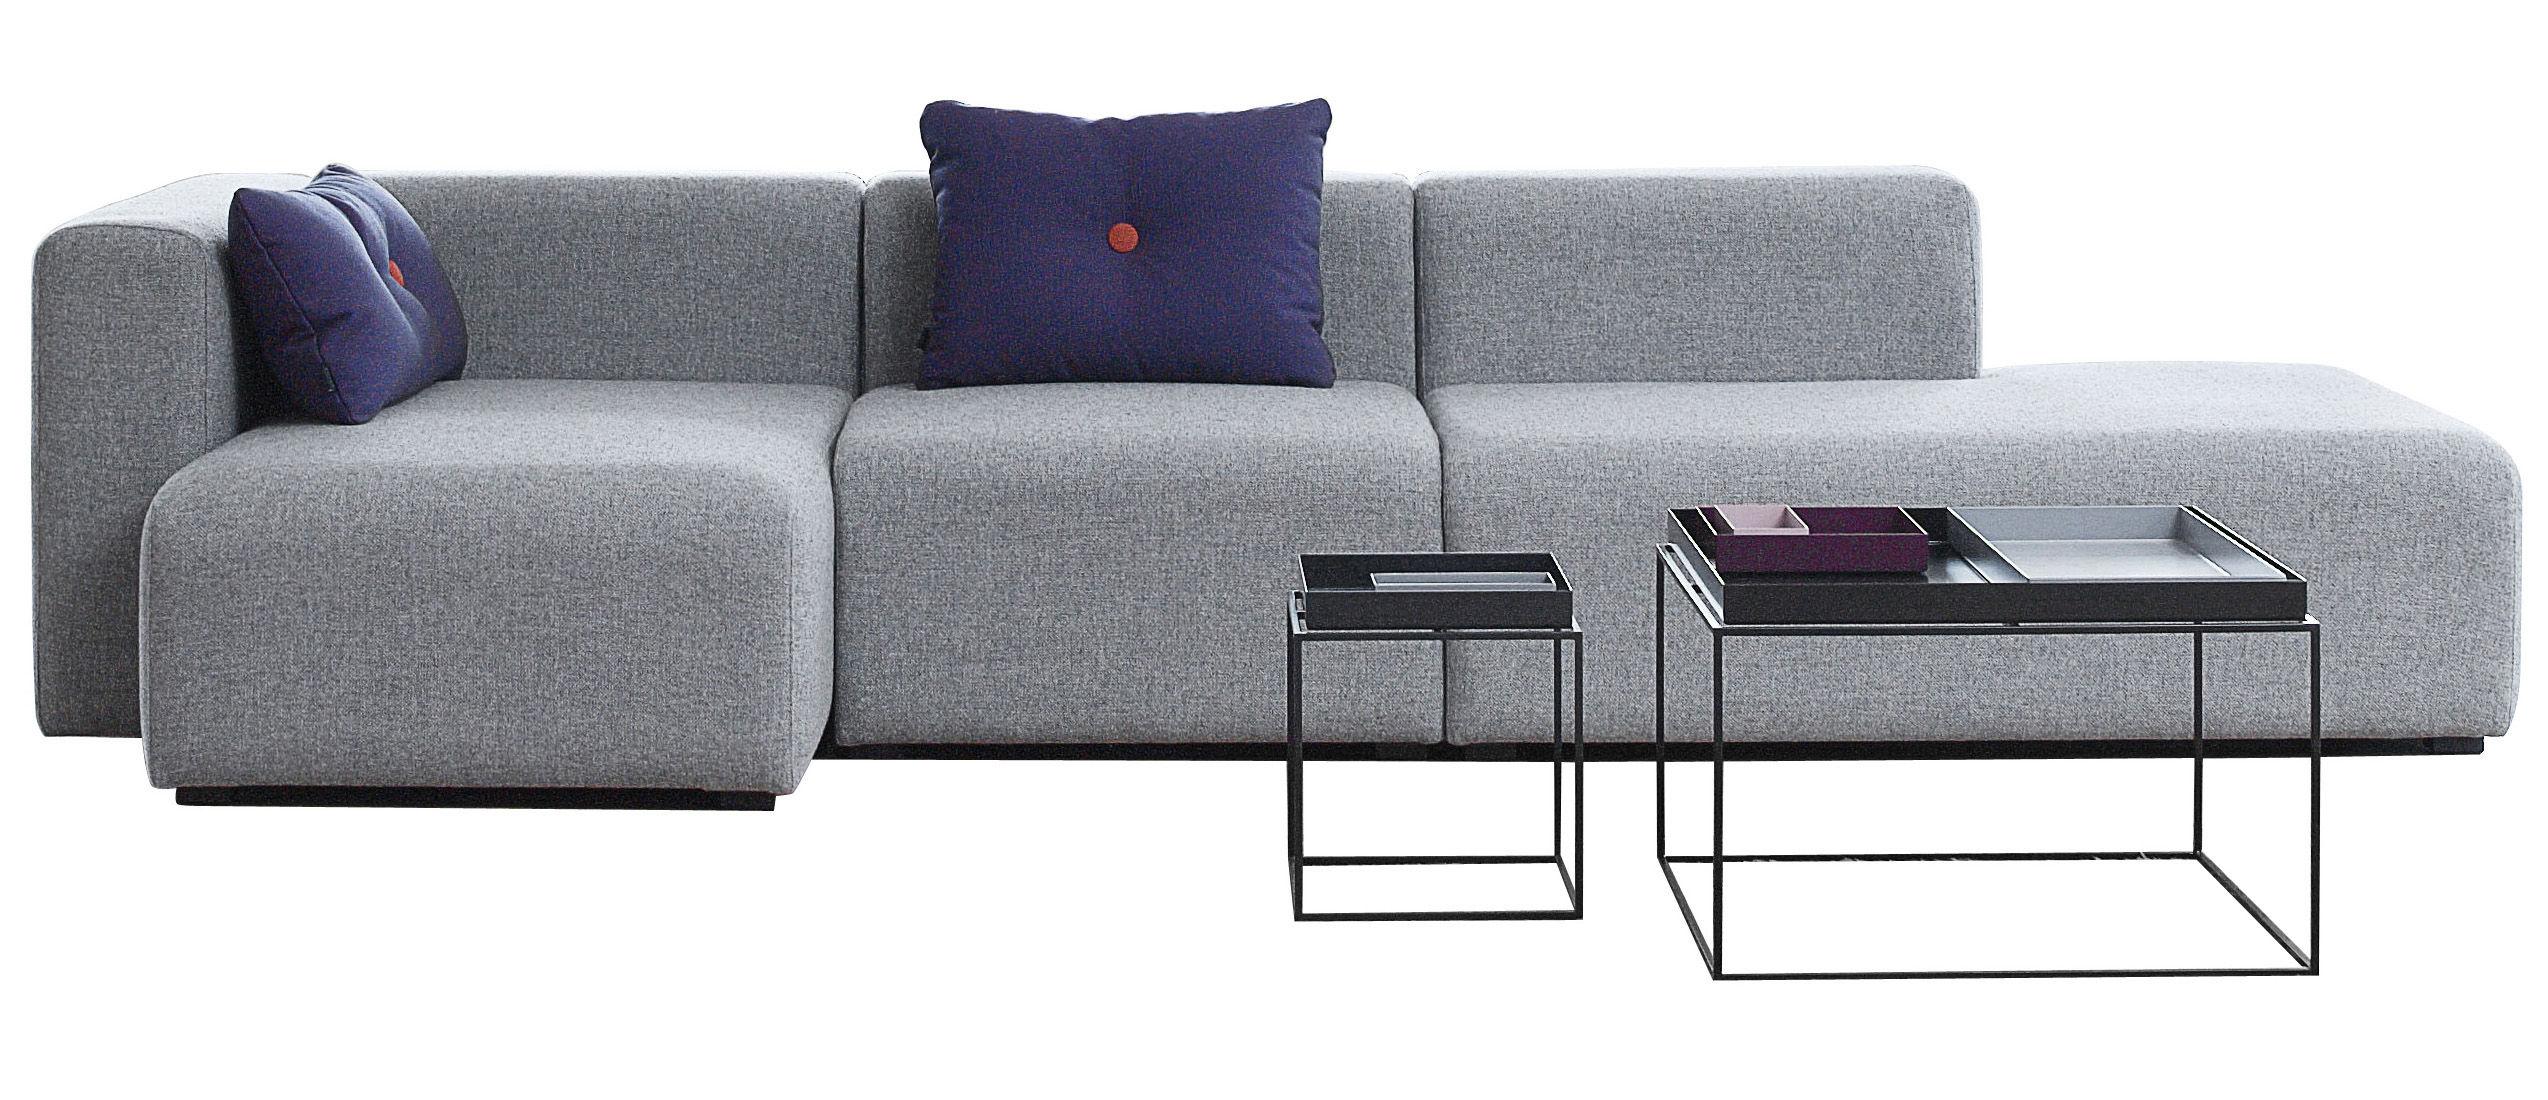 Mobilier - Canapés - Canapé d'angle Mags / L 302 cm - Accoudoir gauche - Hay - Gris clair - Accoudoir gauche - Tissu